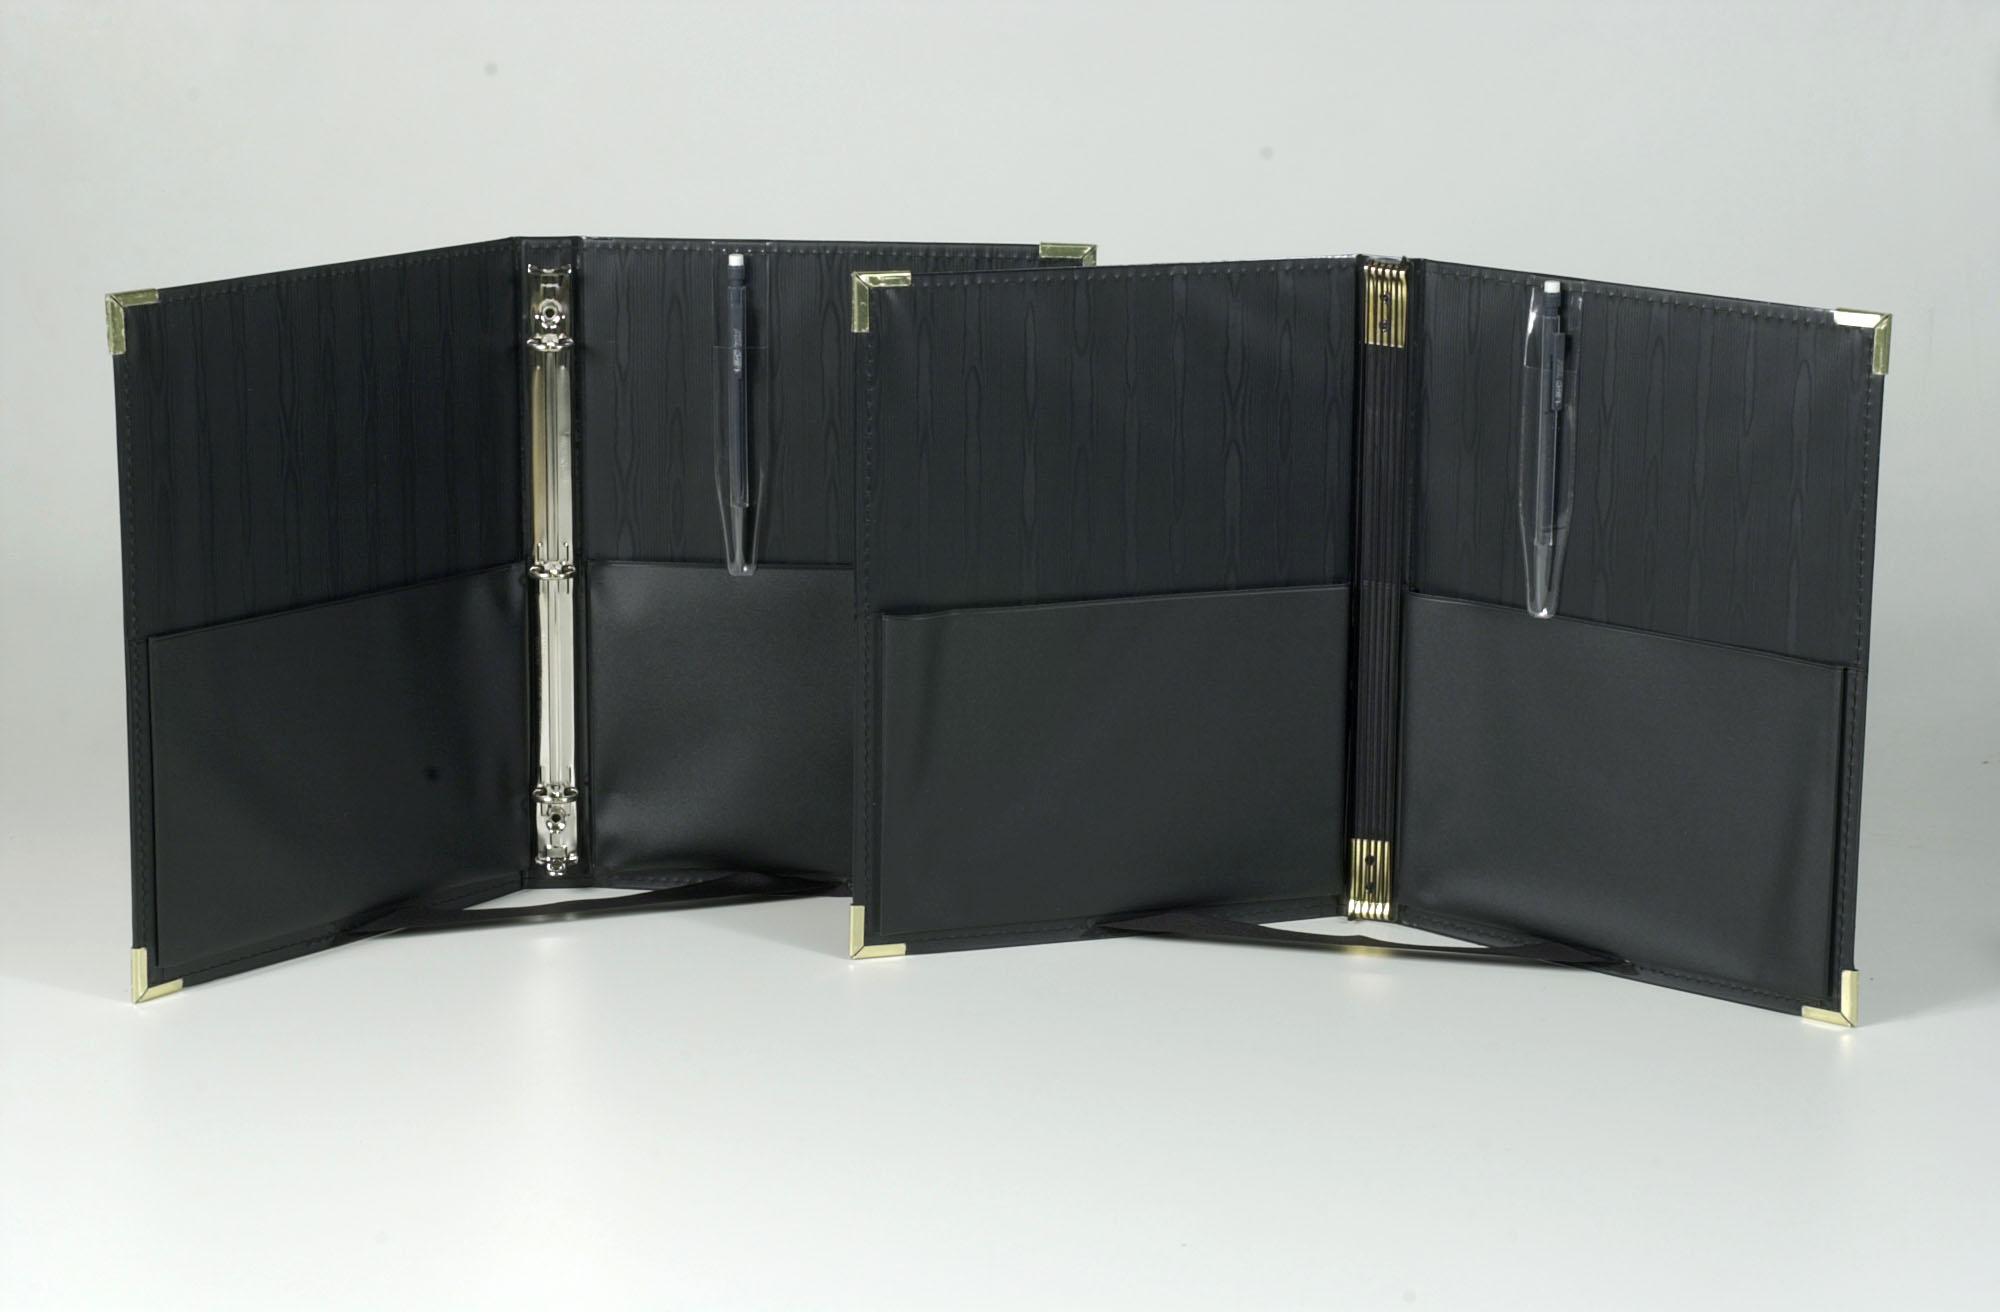 LEGACY CHORAL FOLDER (60L) Cover Image